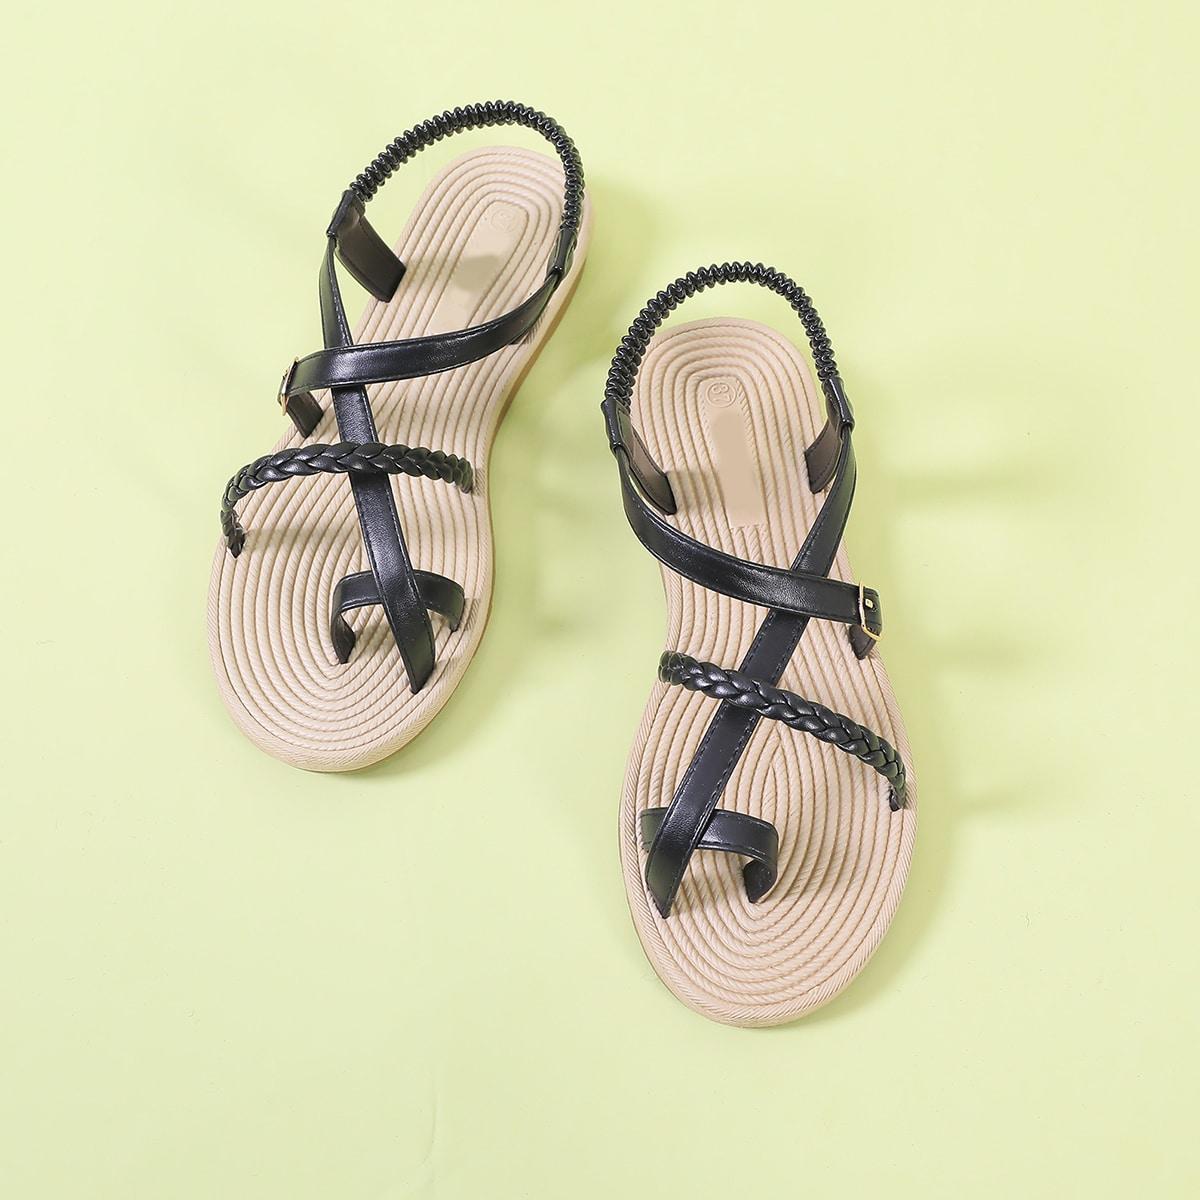 shein Gevlochten riem Slingback Thong sandalen